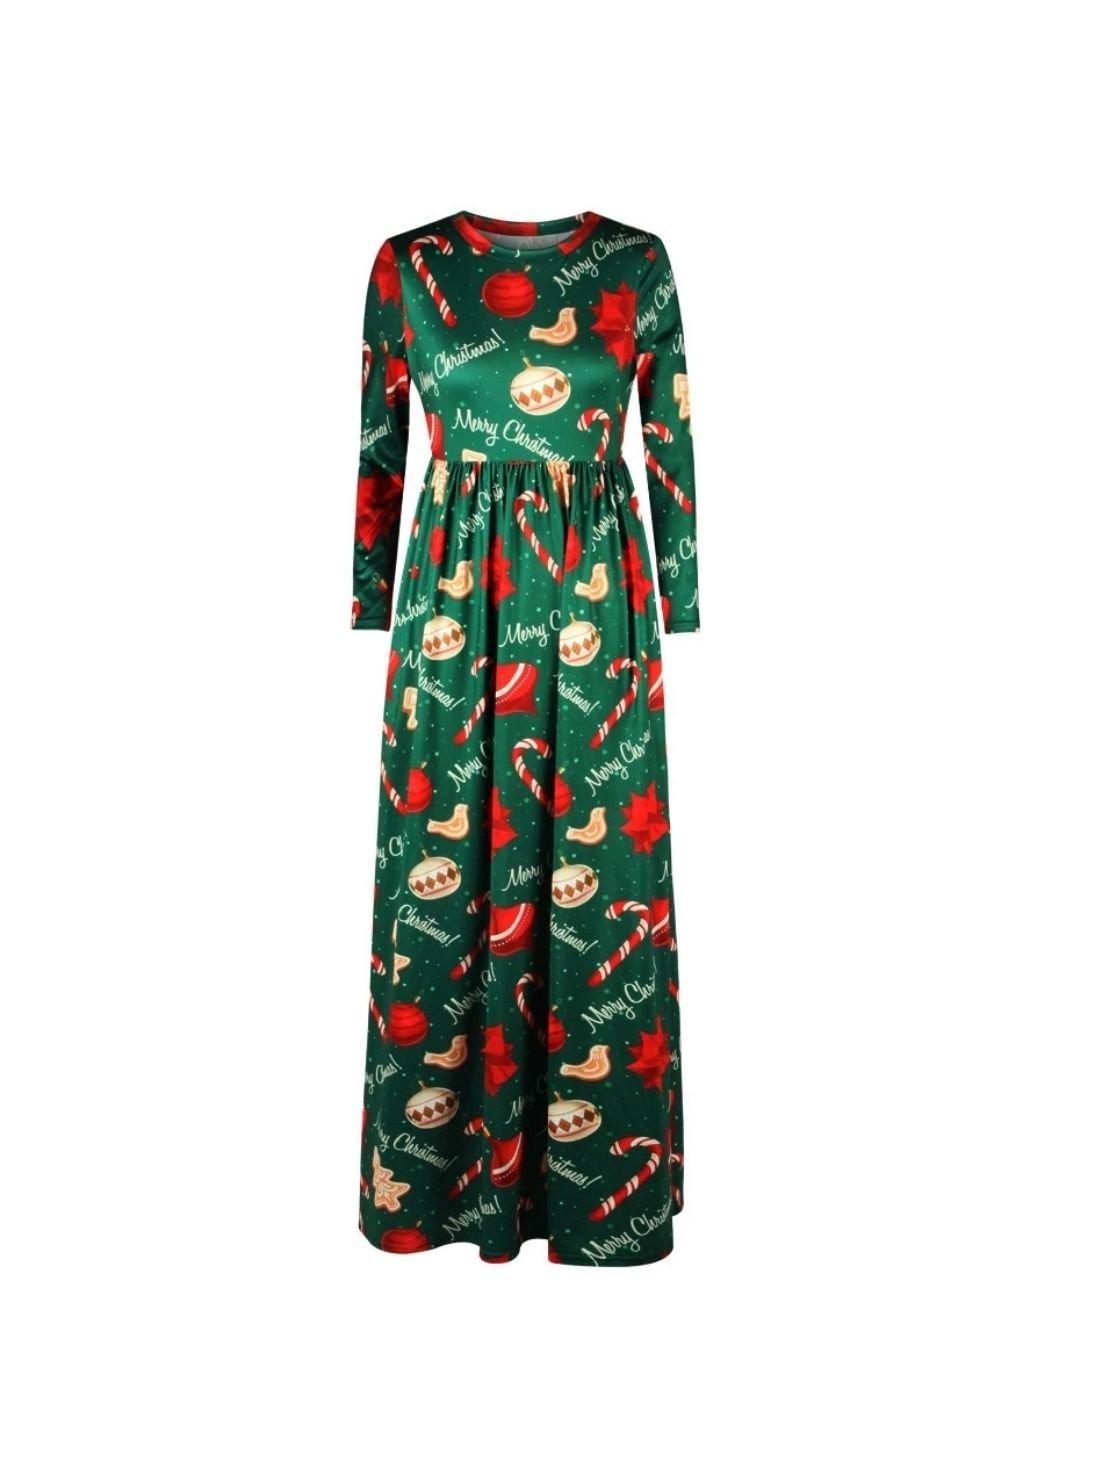 Wholesale Women's Christmas Ornaments Dress